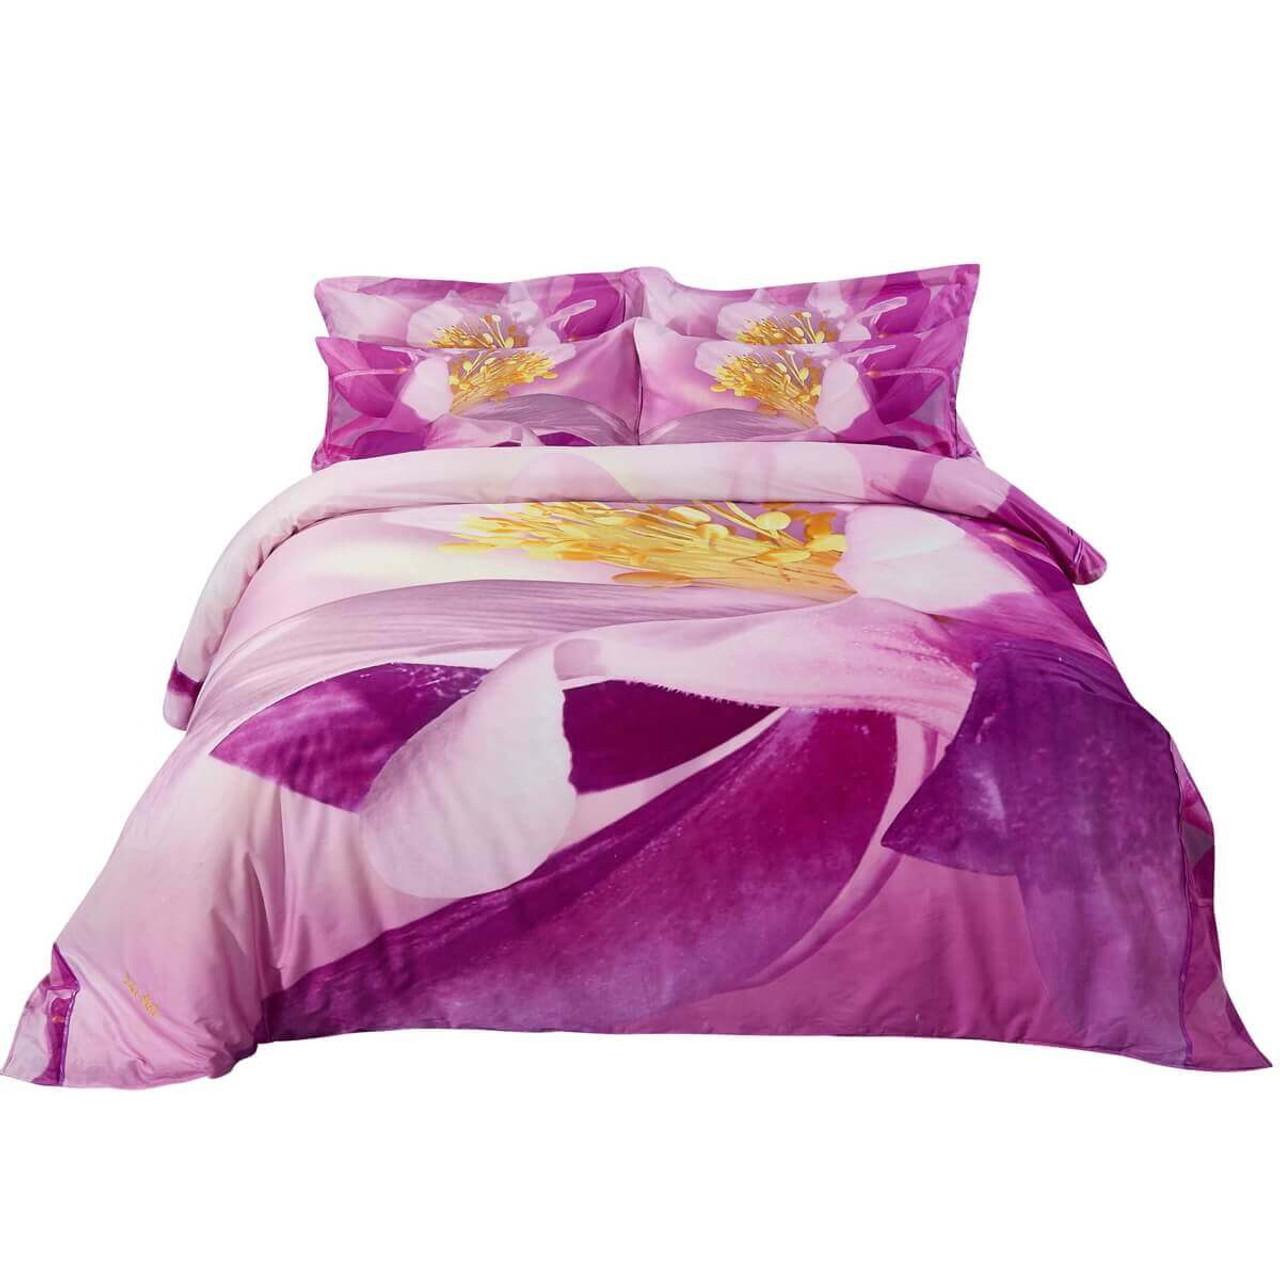 Drop-shipping  Floral Bedding, Dolce Mela - June DM703Q